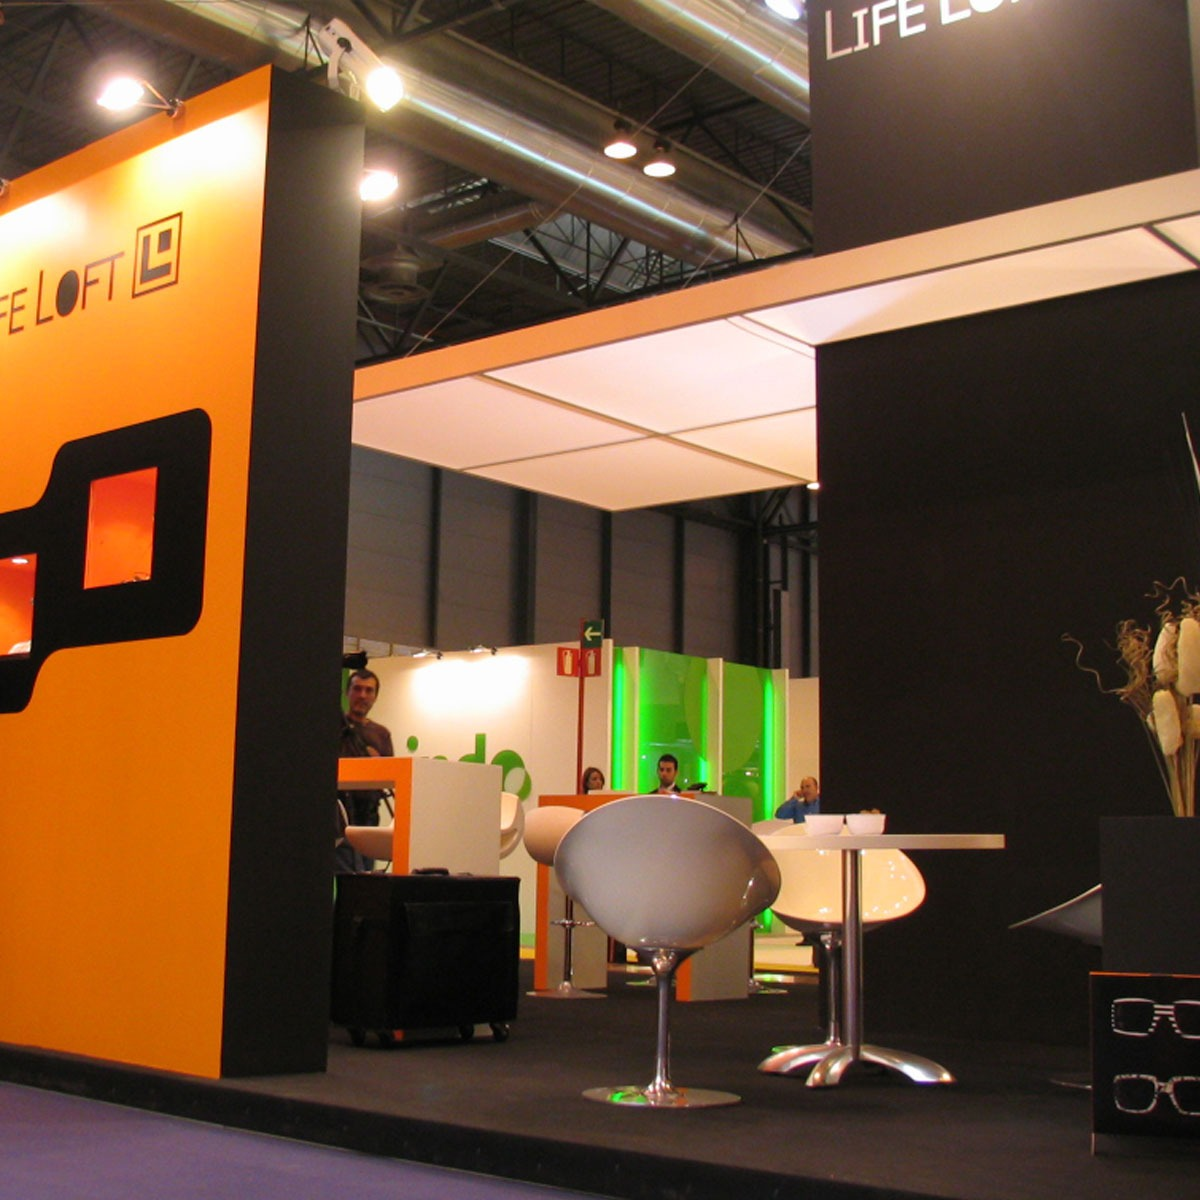 Diseño stand Life Loft 2